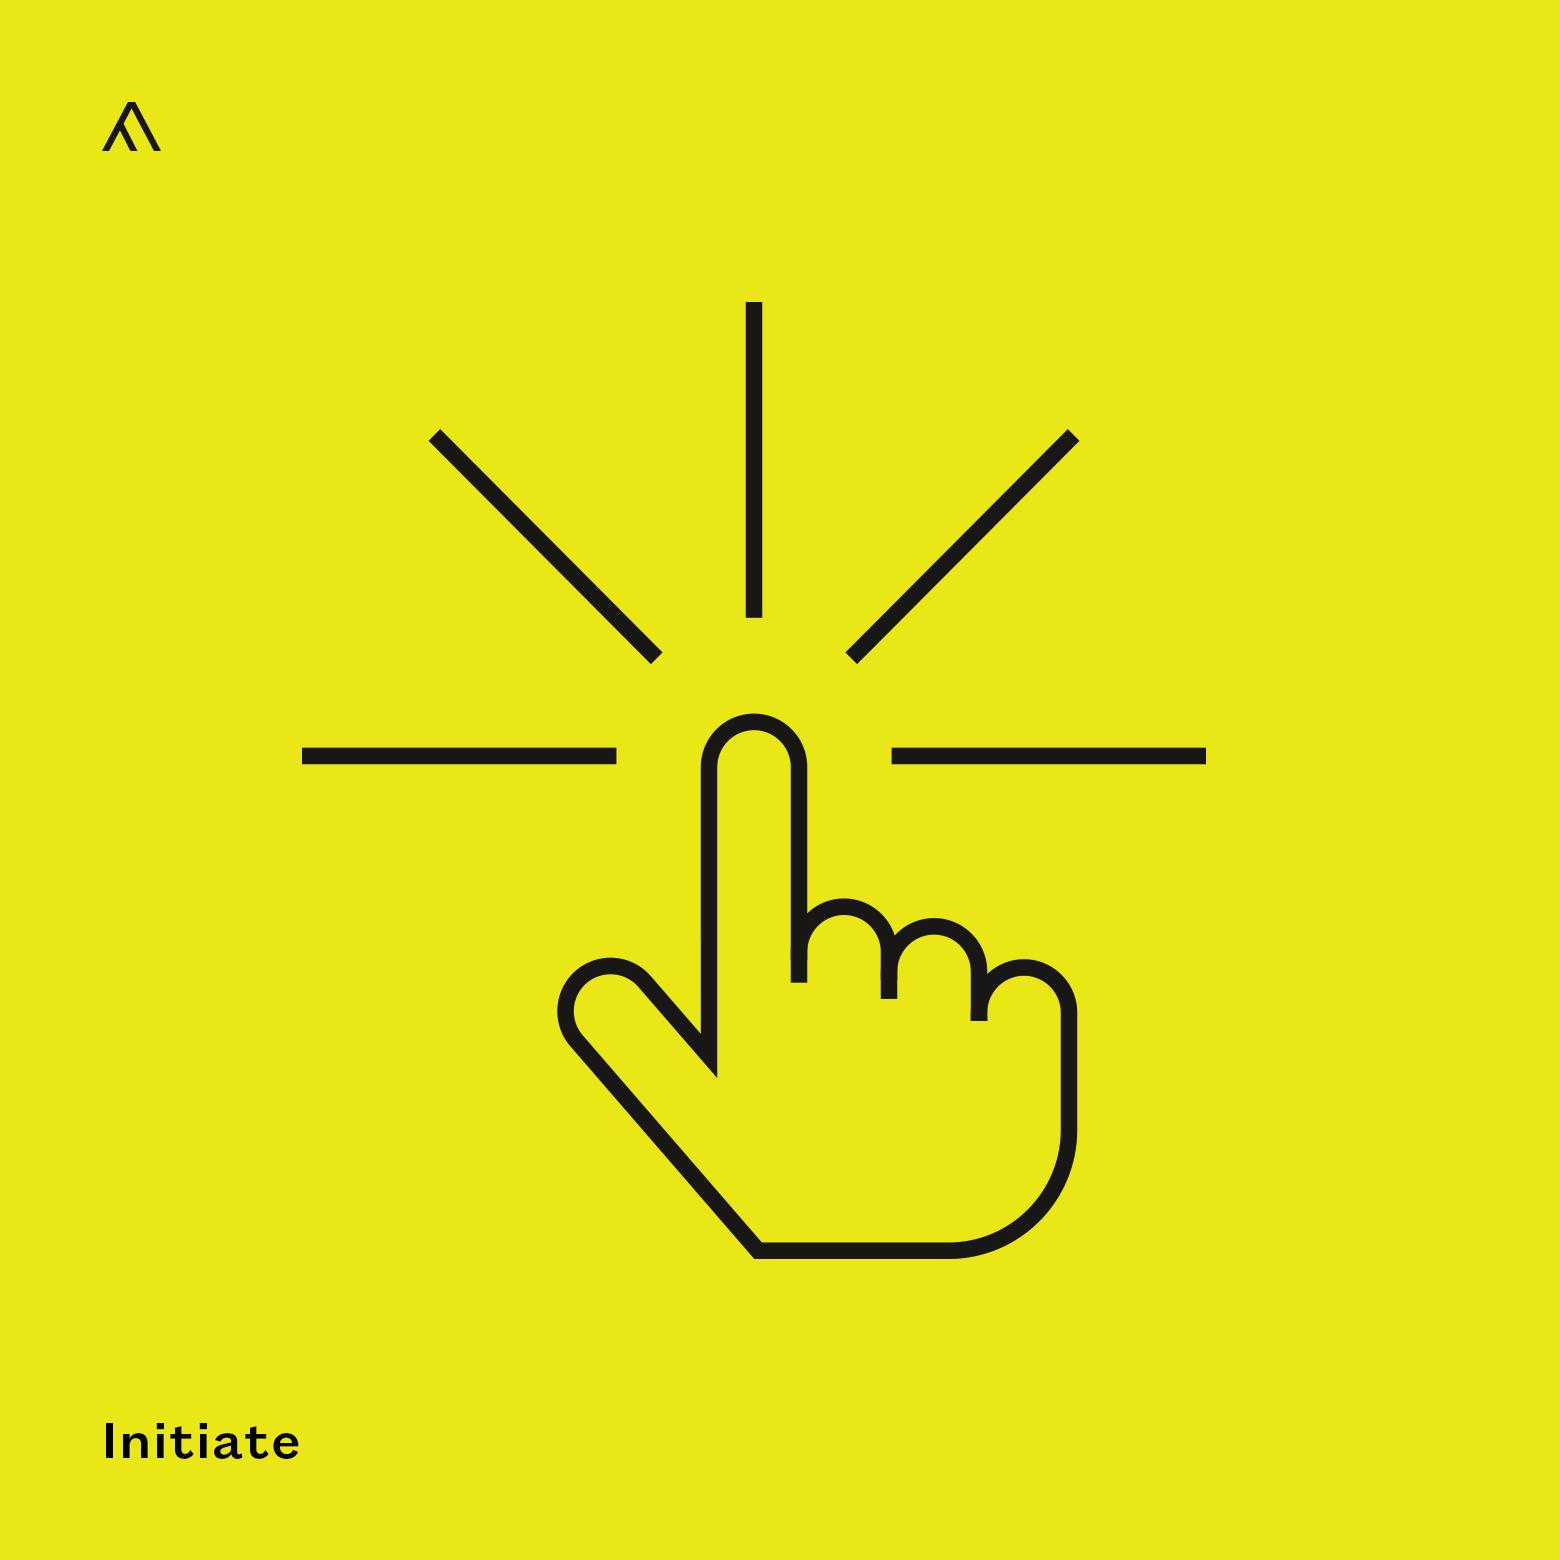 asx-corporatedesign-buero-ink-initiate